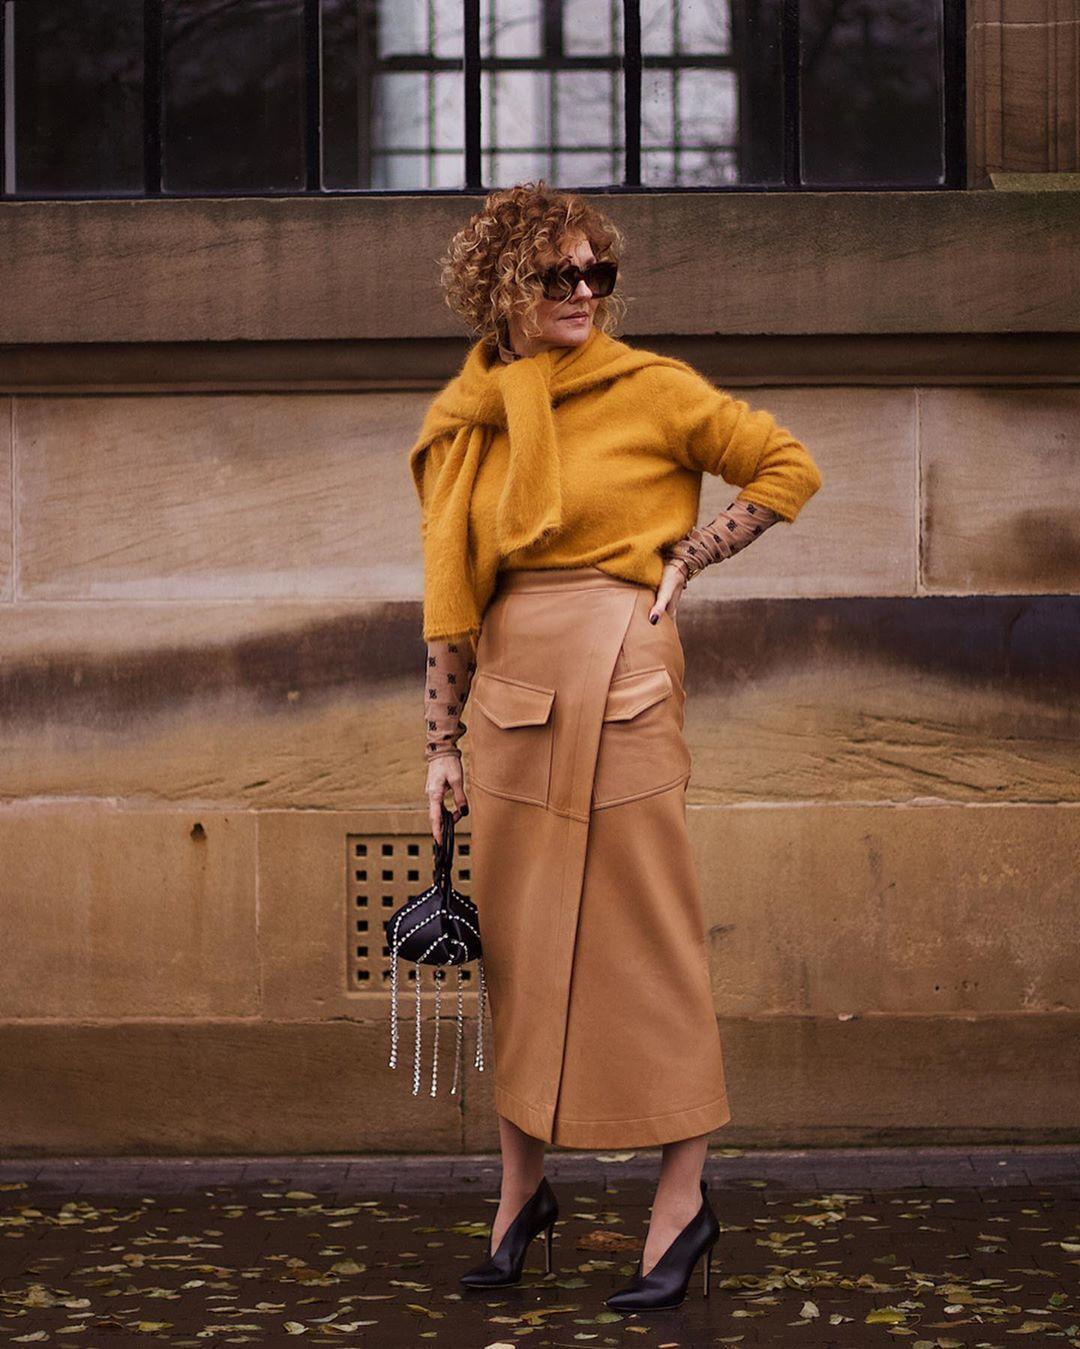 sweater skirt wrap skirt leather skirt pumps handbag